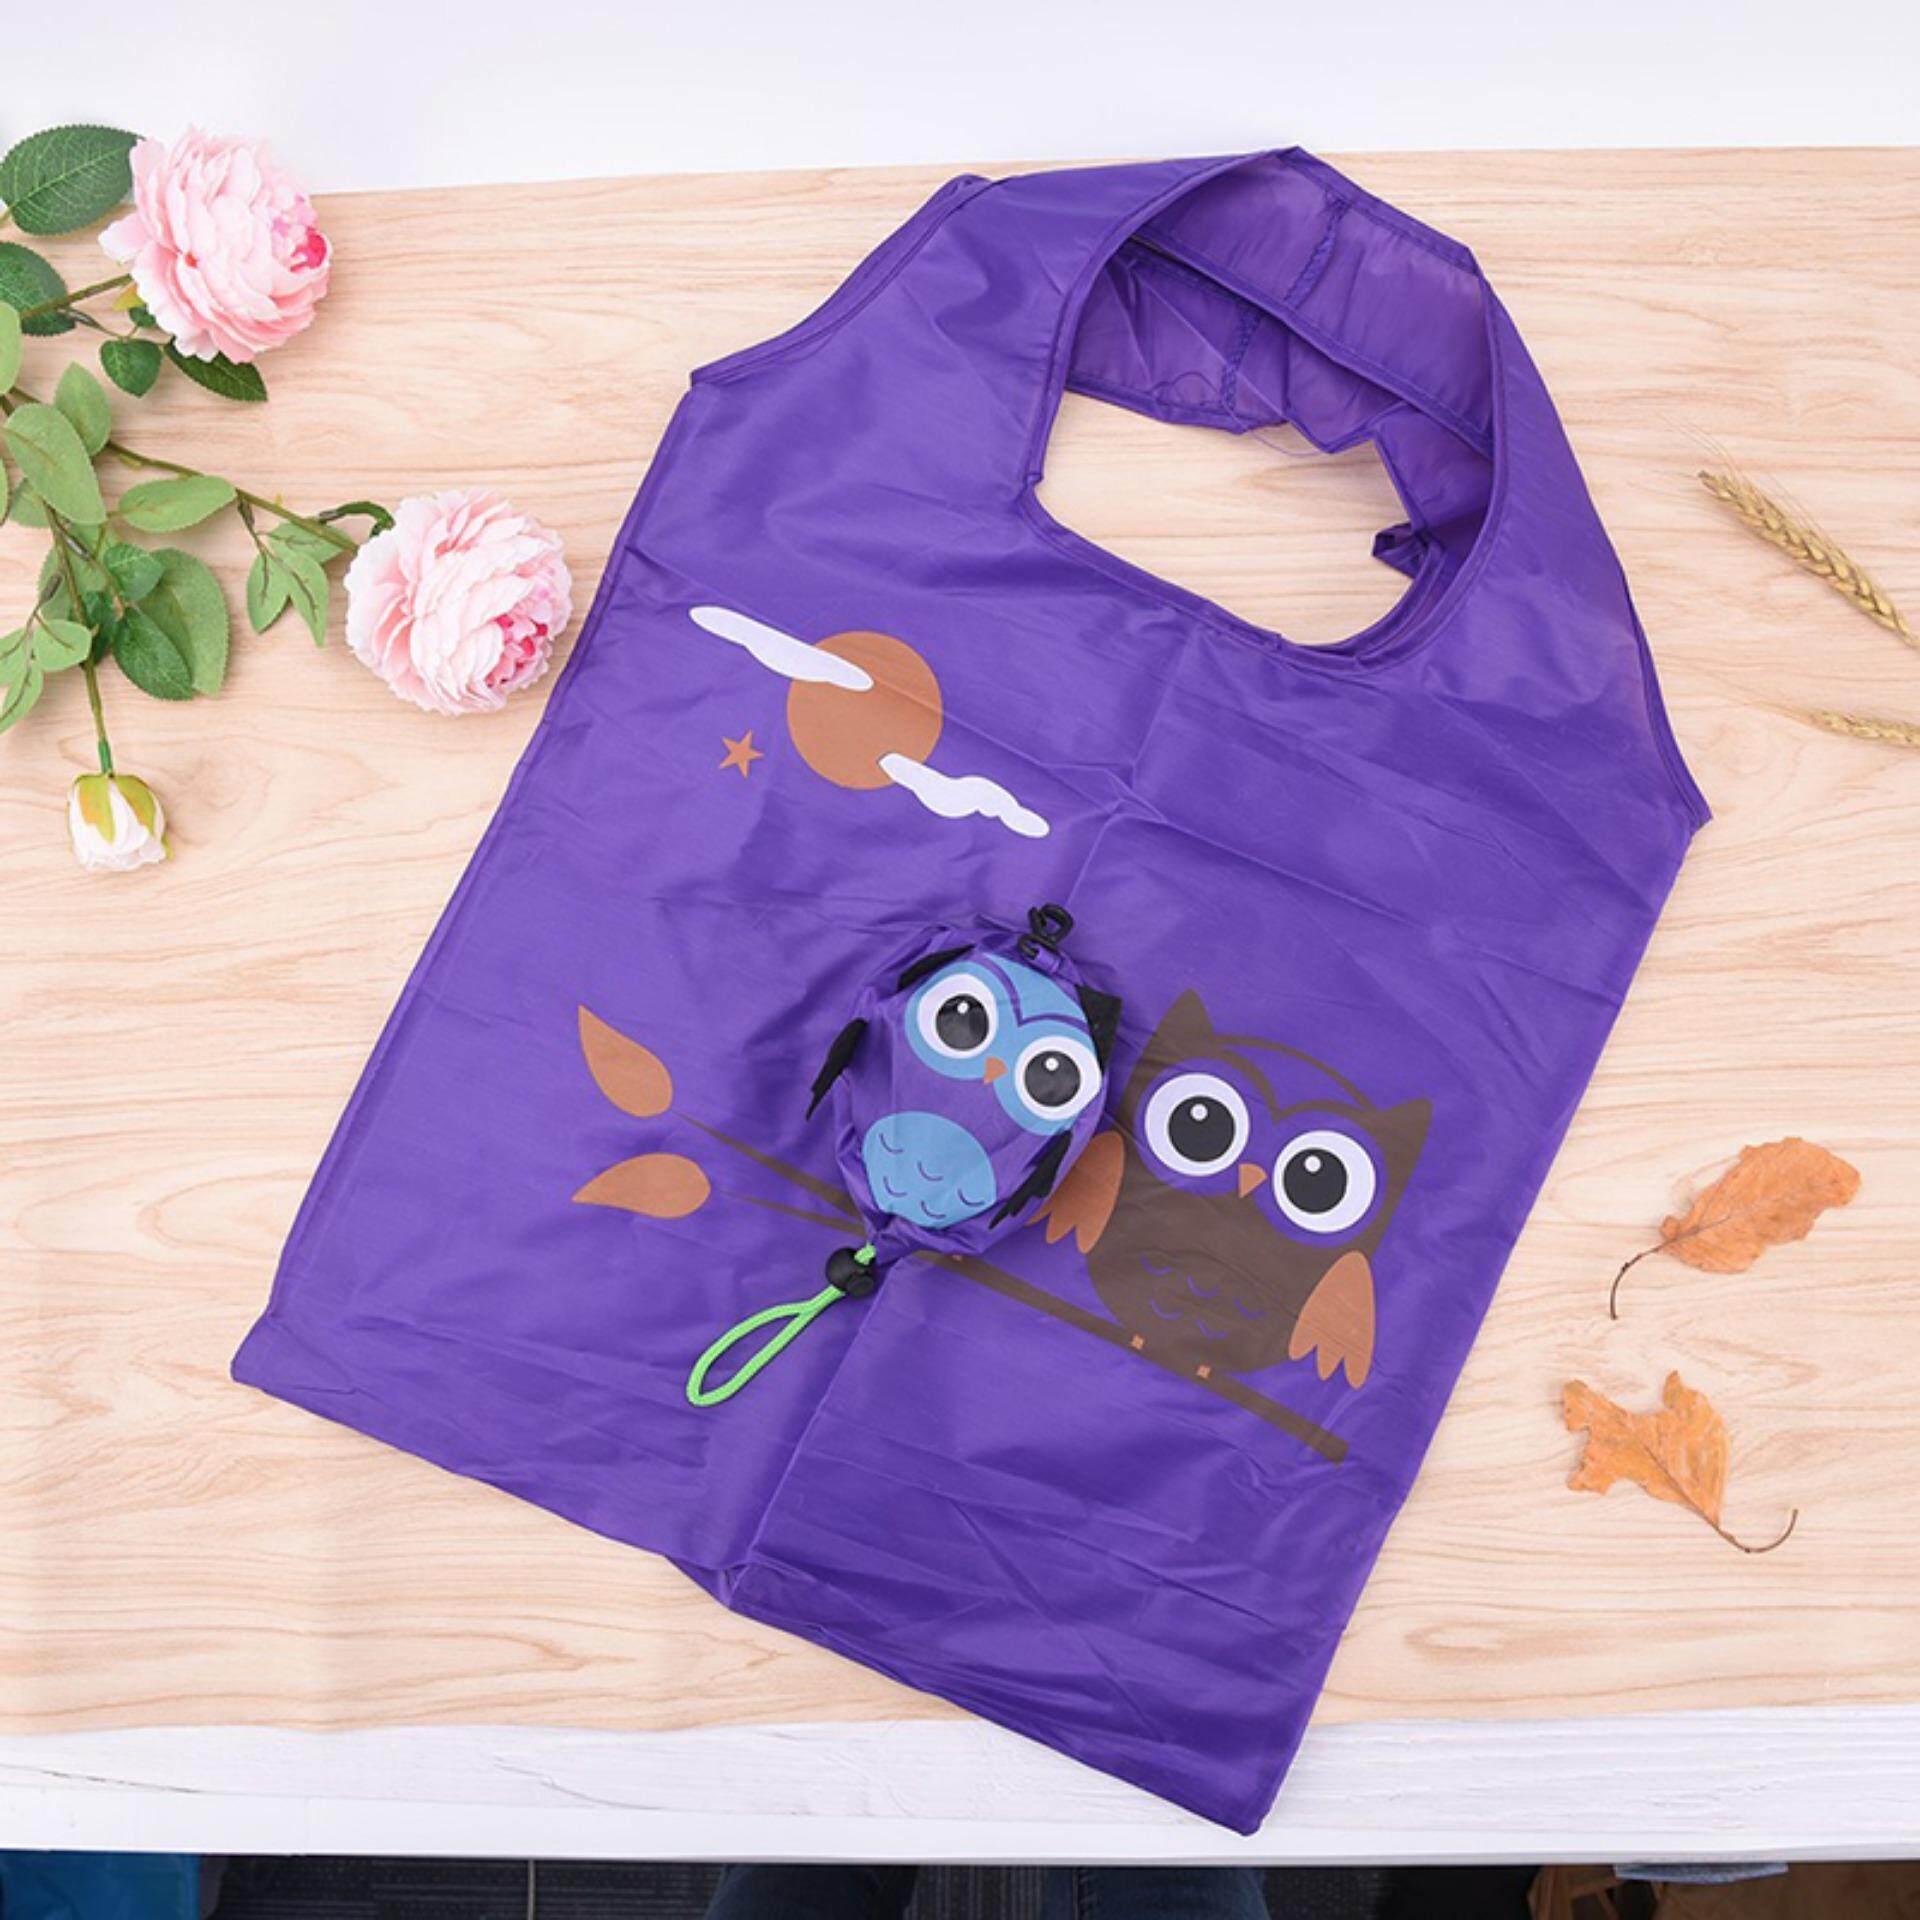 Handy handbag shoulder travel foldable recycle tote grocery storage shopping bag Purple - intl